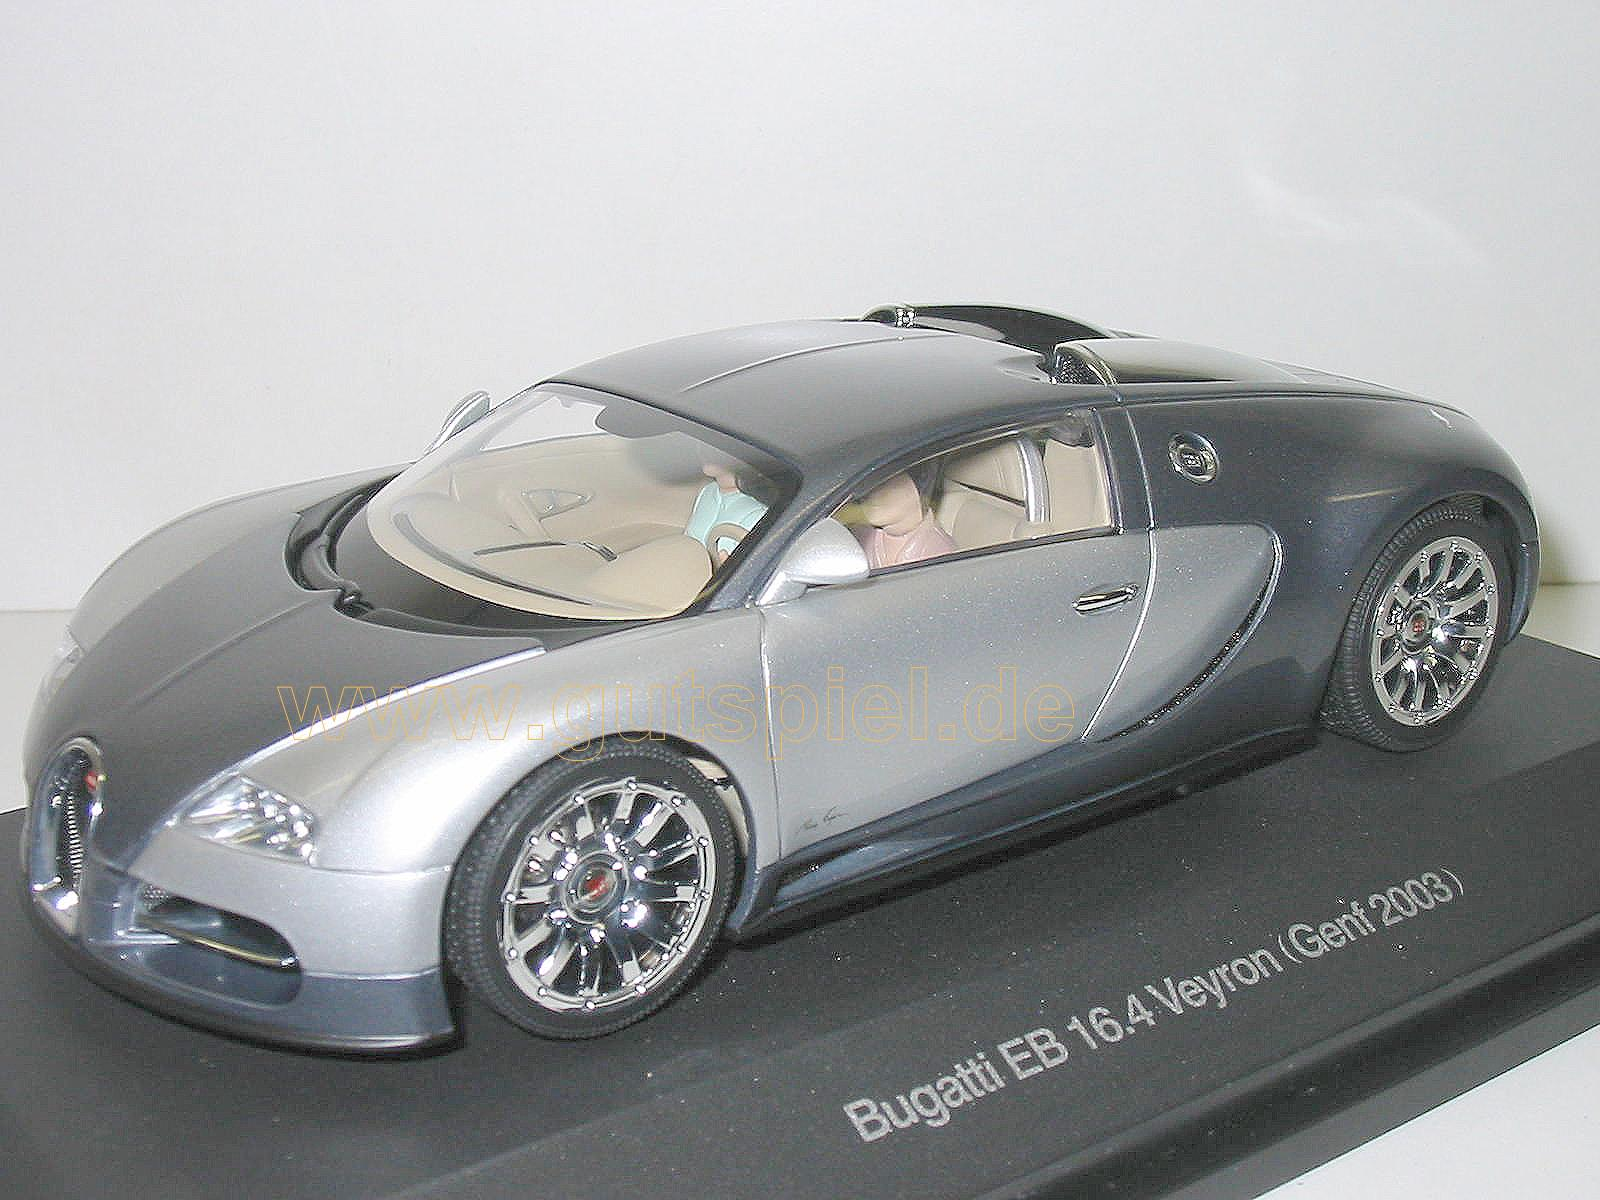 autoart 1 24 bugatti eb 16 4 veyron 2003 genf silber grau. Black Bedroom Furniture Sets. Home Design Ideas